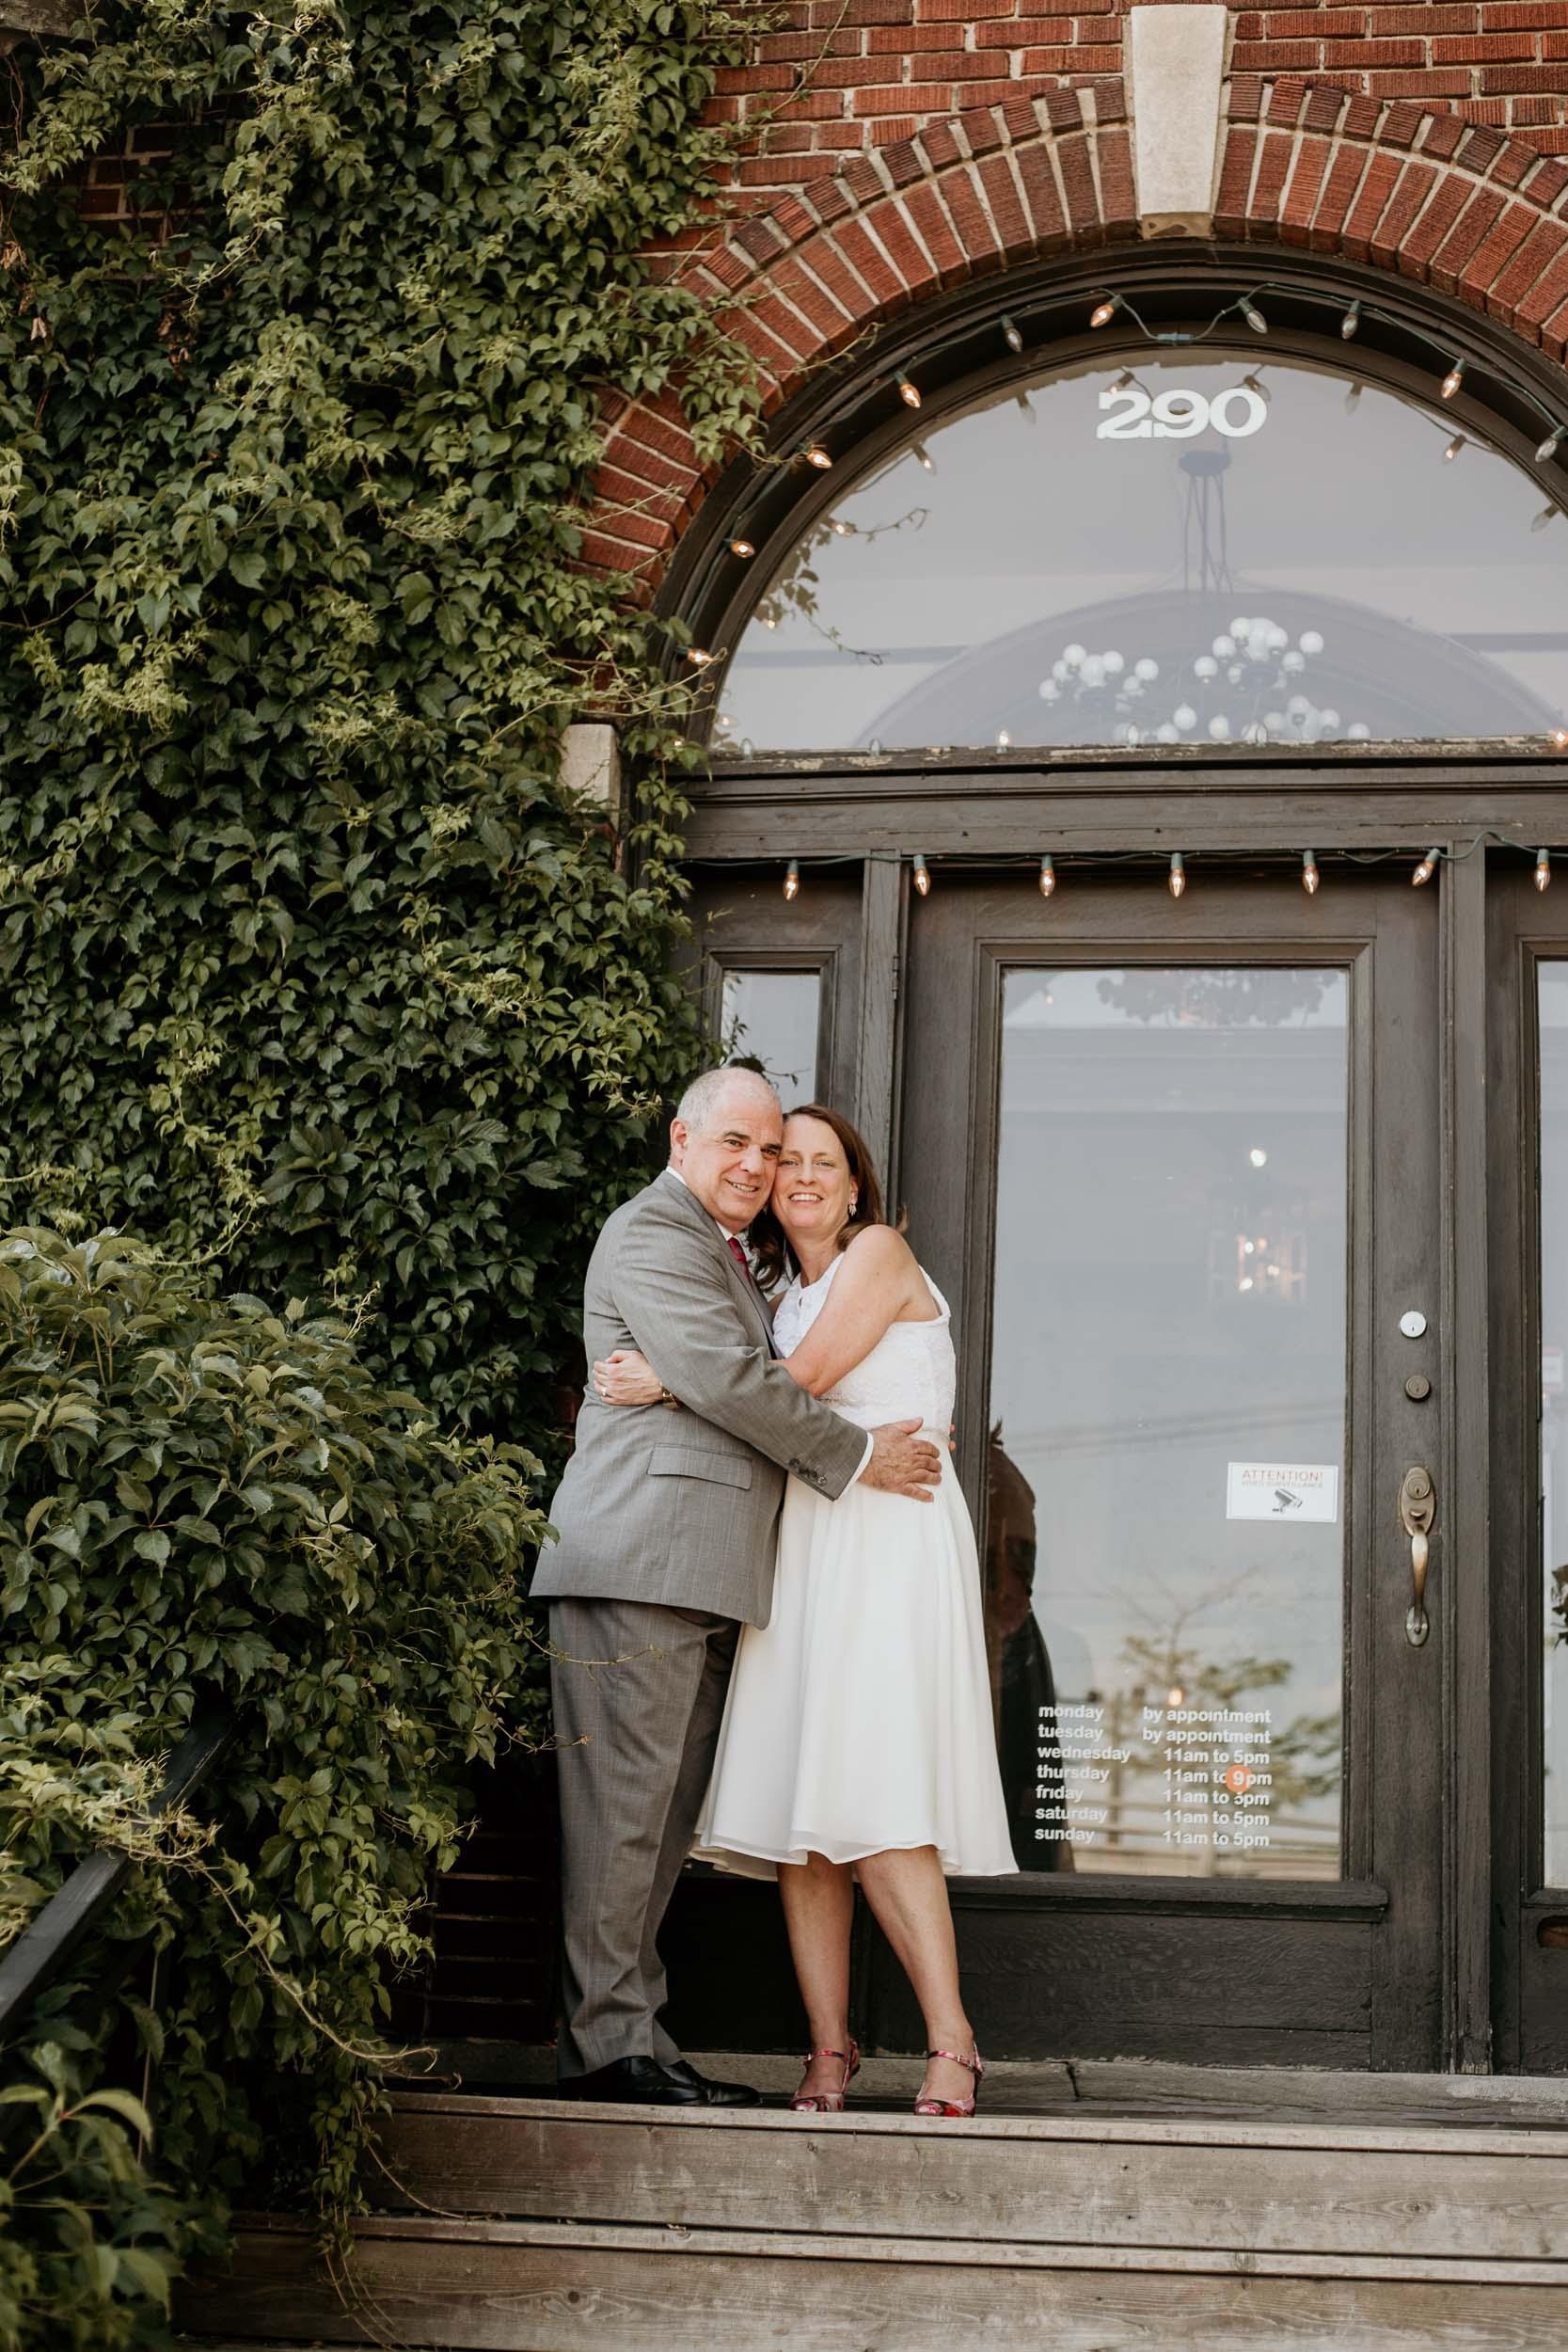 elopement-engagement-photographer-ottawa-4560.jpg